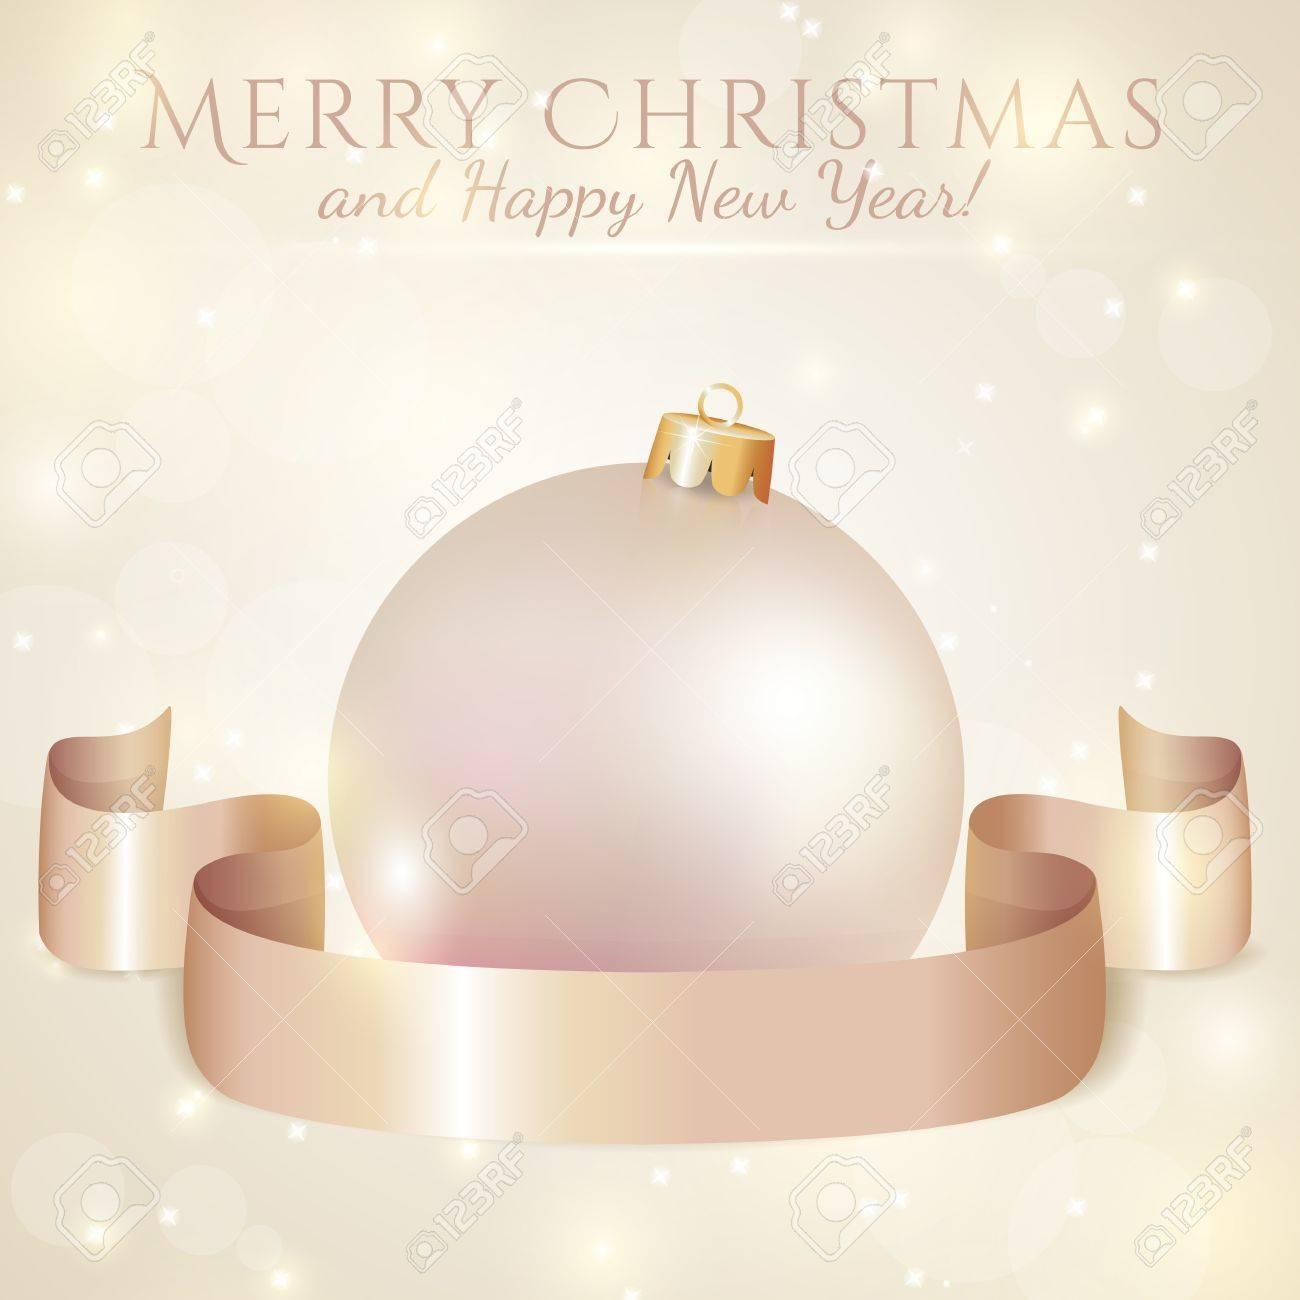 Happy New Year Elegant Images 13